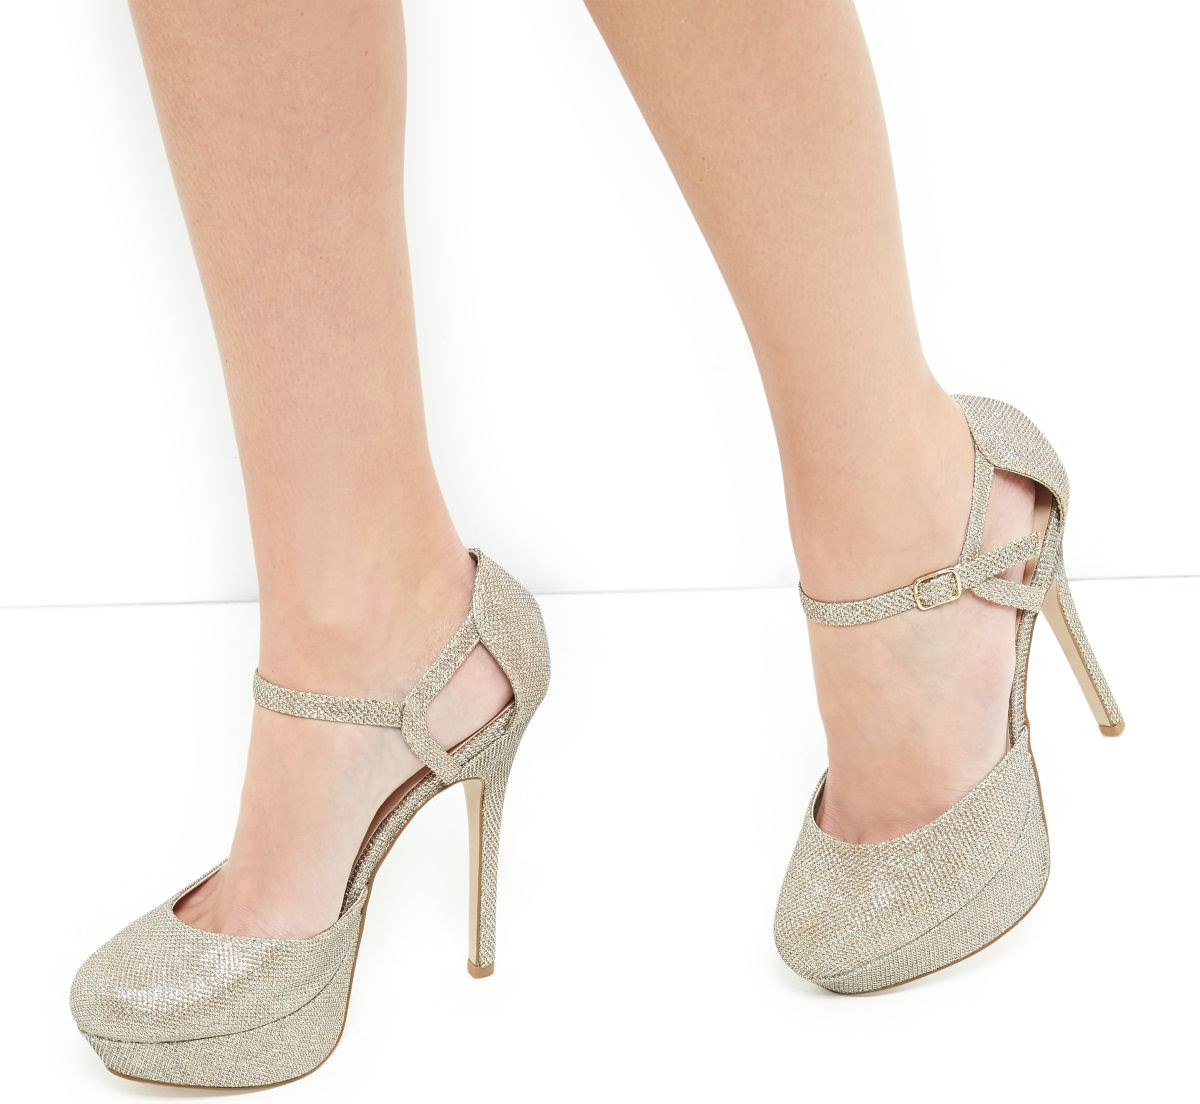 Strap Platform Heels For Women